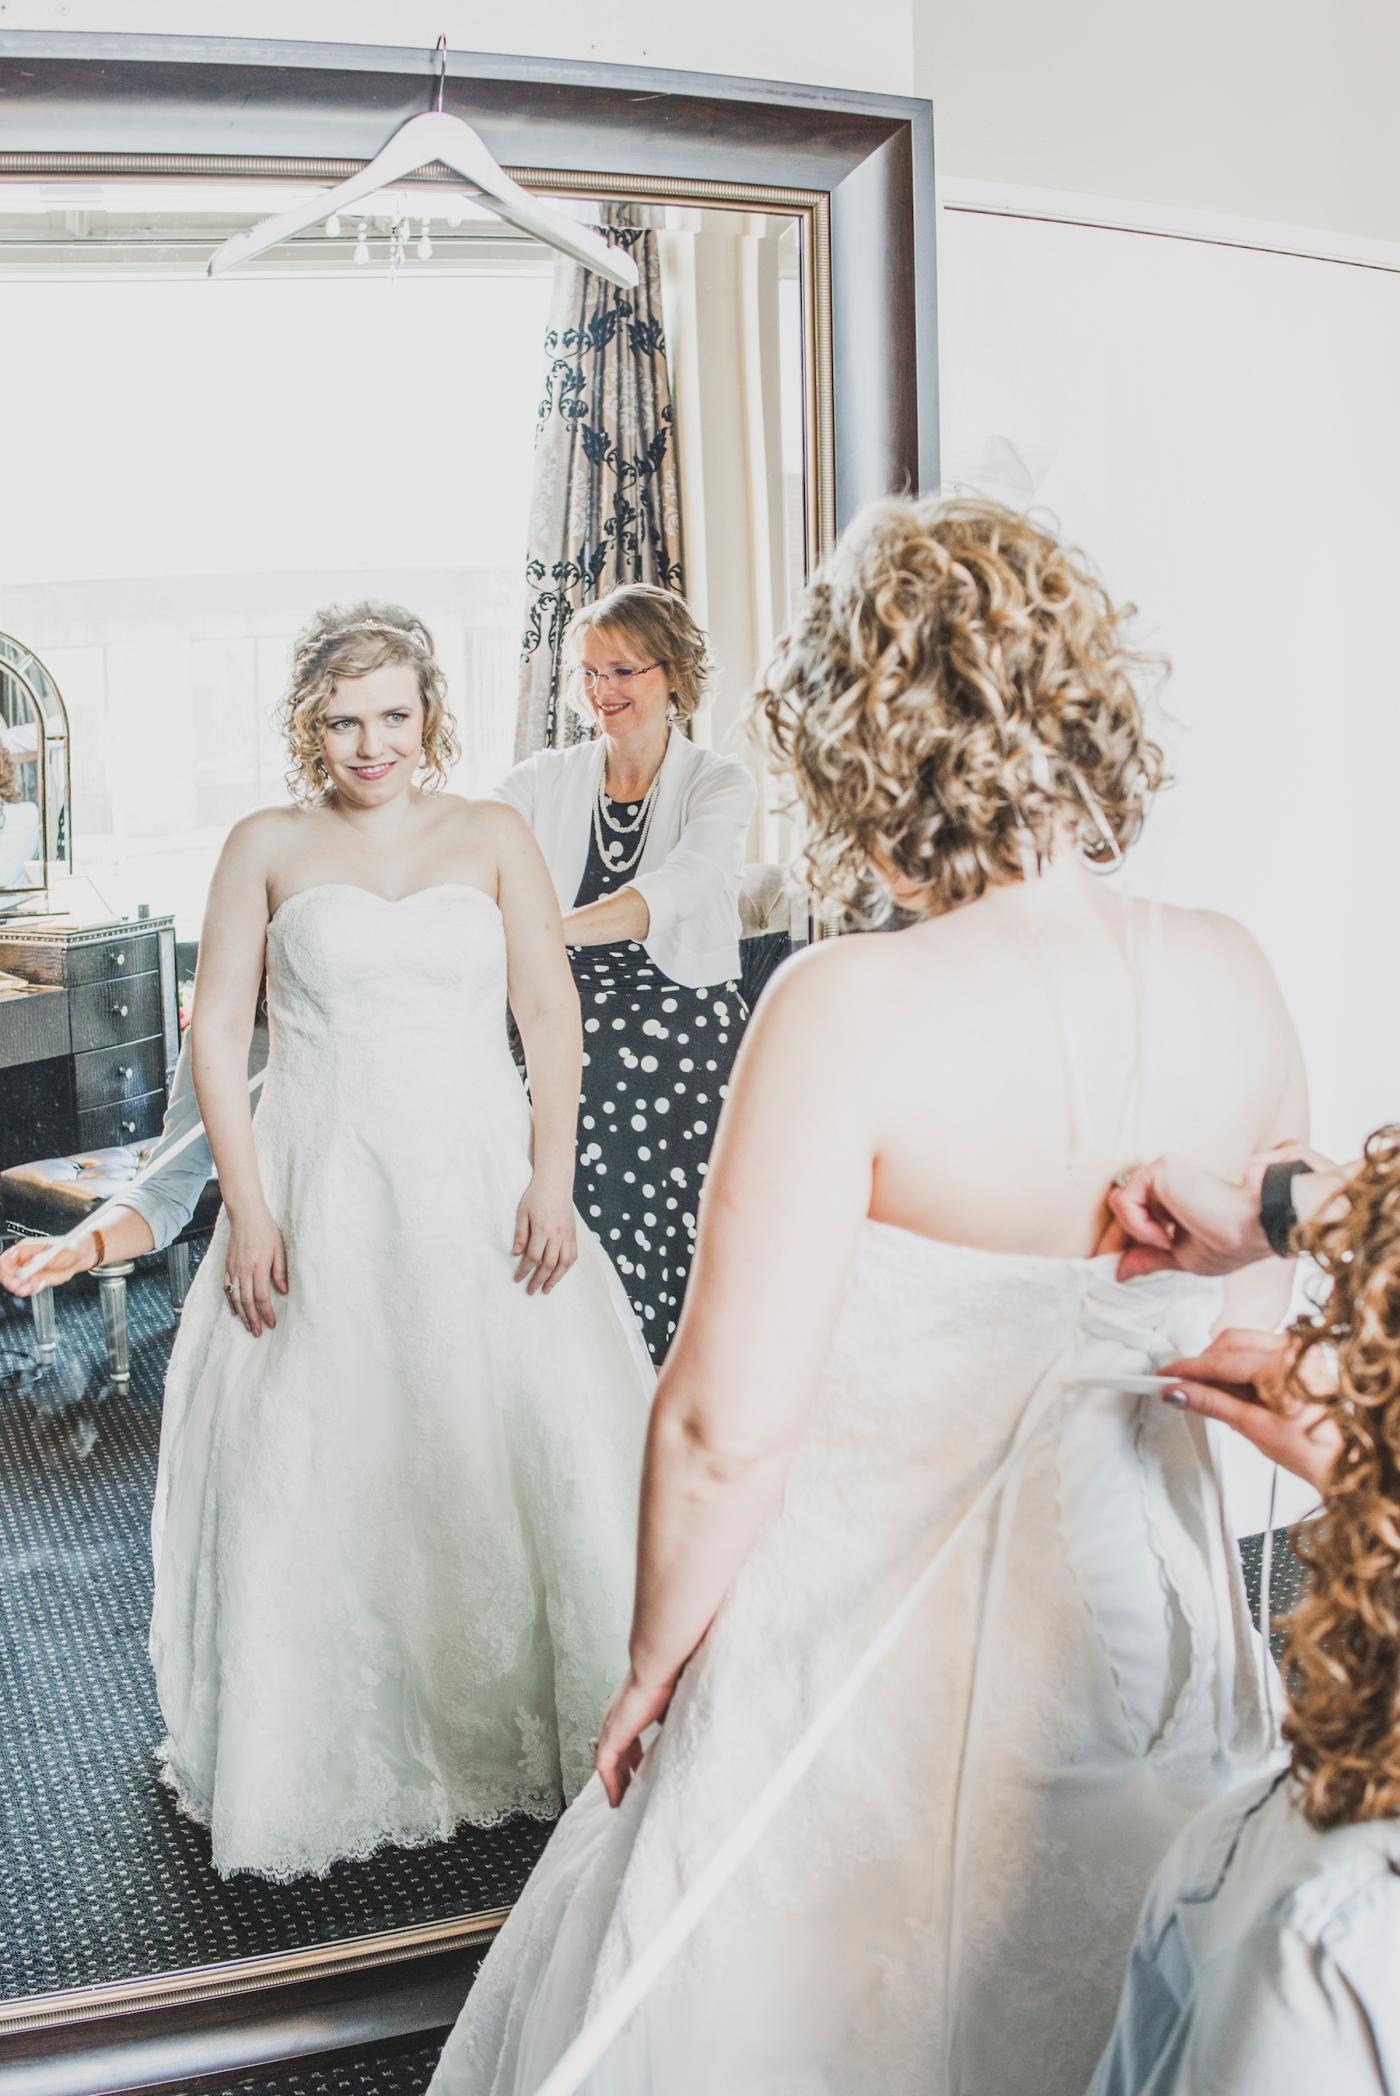 DSC_1865Everett_Wedding_Ballroom_Jane_Speleers_photography_Rachel_and_Edmund_Getting_ready_2017